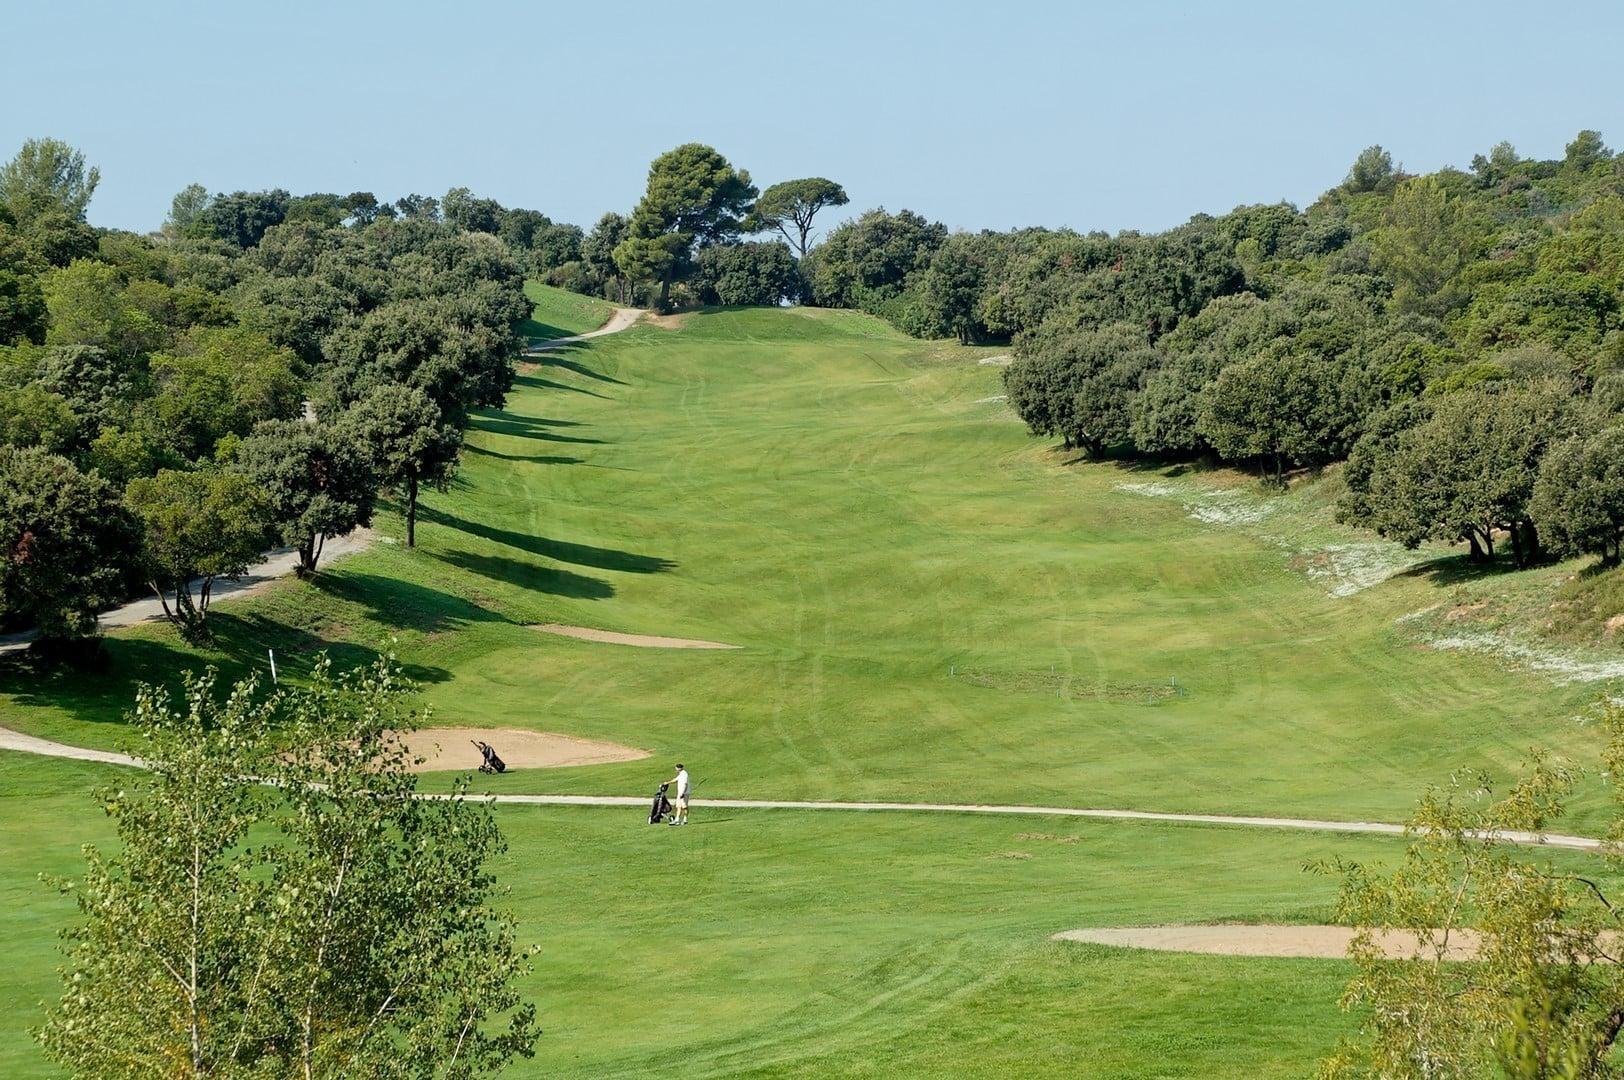 Frankreich Sofitel Marseille Golfurlaub